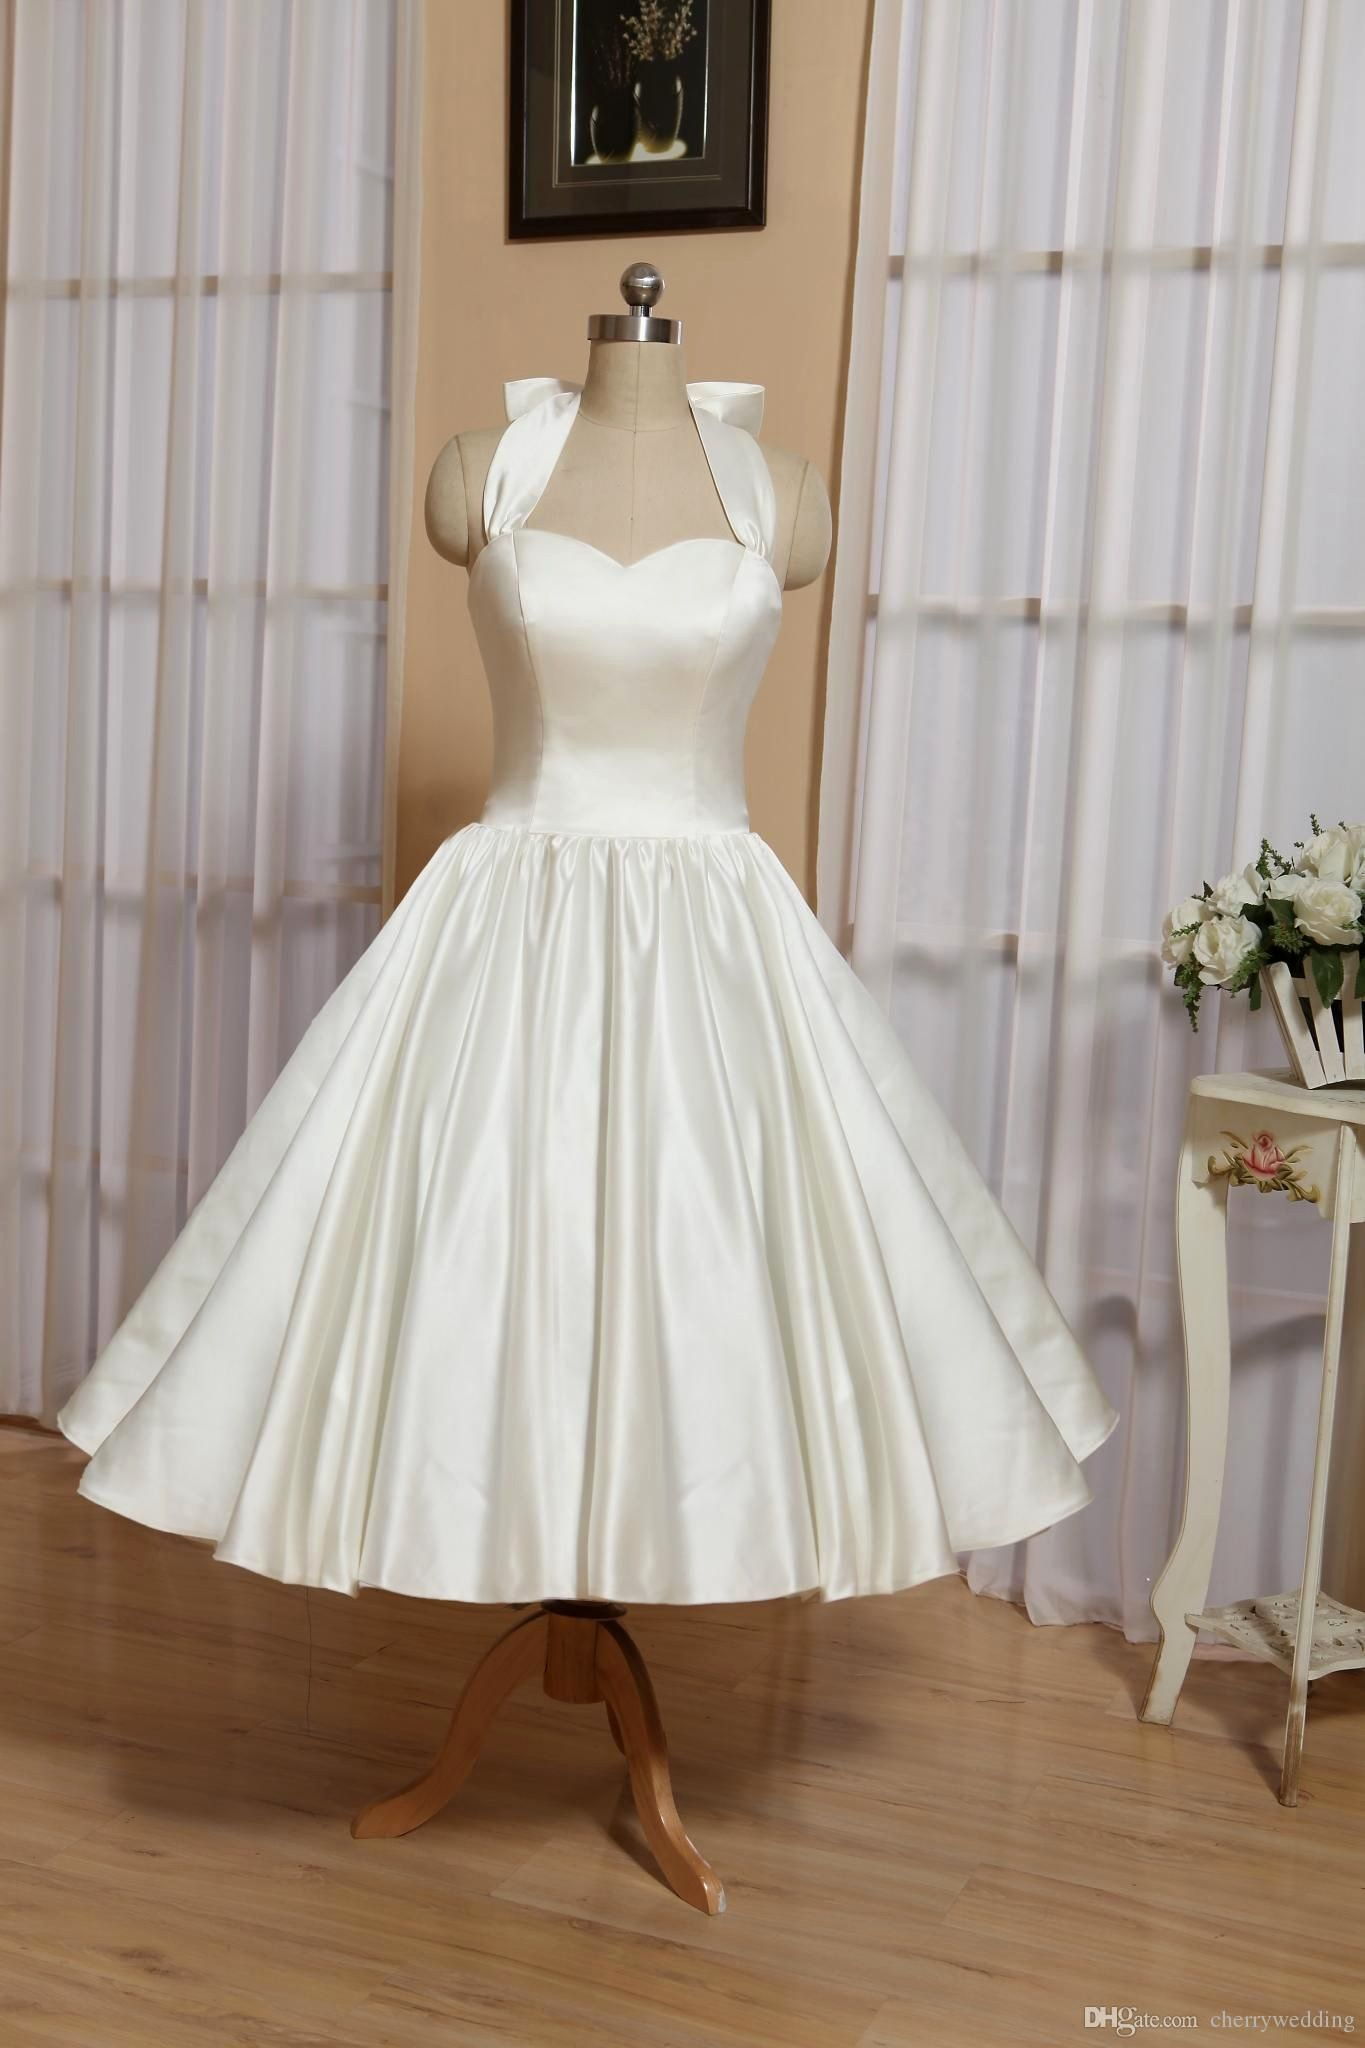 25 White Rockabilly Wedding Dress Wedding Dresses 50s